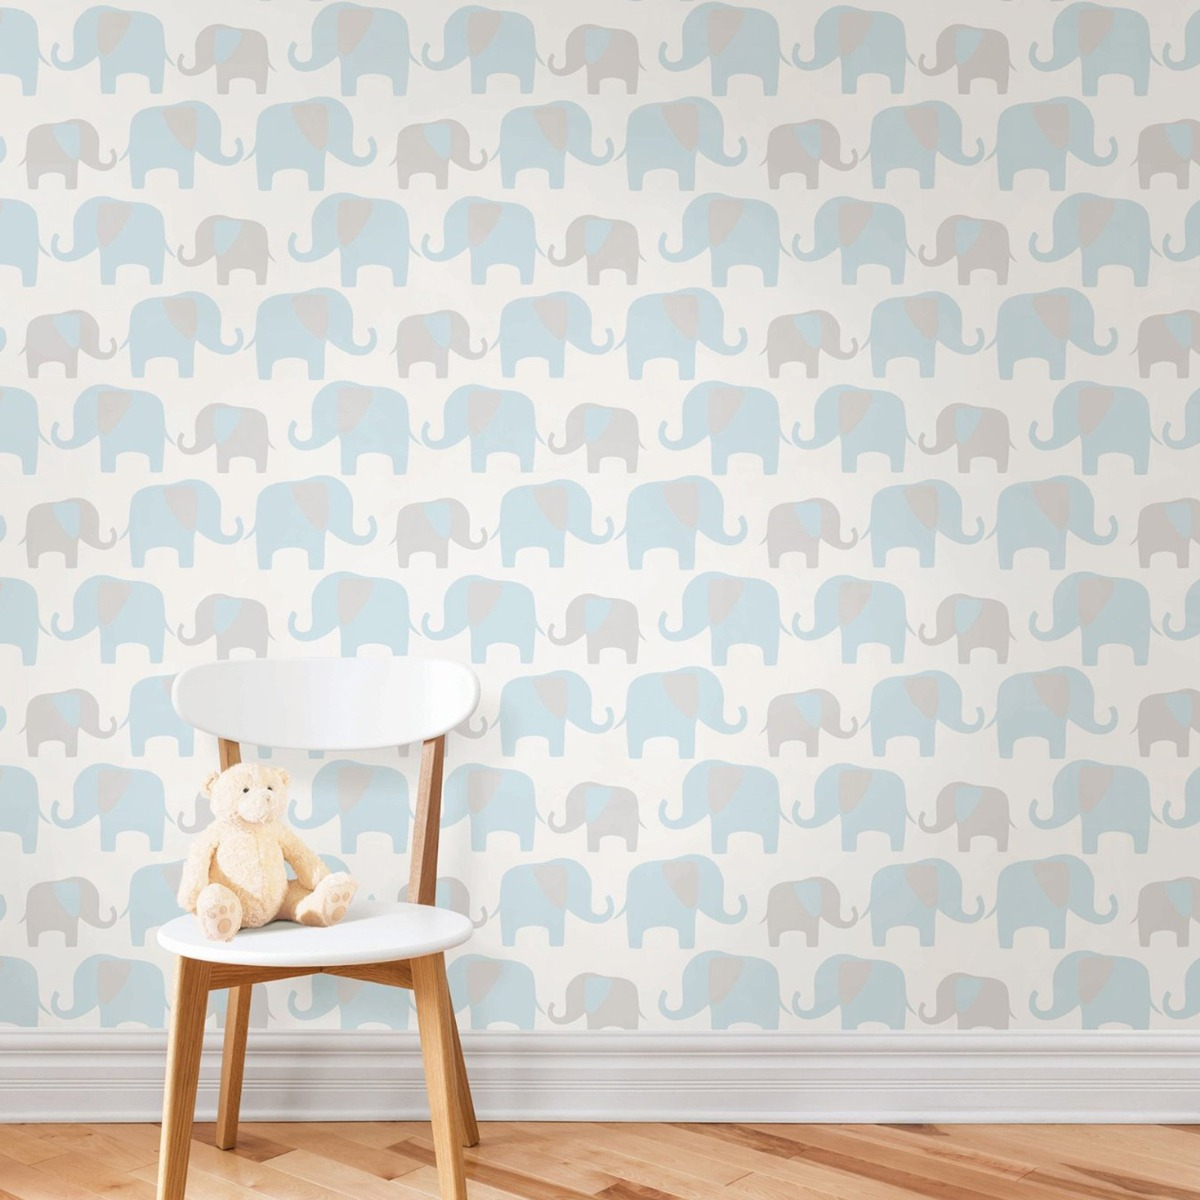 NuWallpaper Elephant Parade Peel And Stick Wallpaper Blue Fine Decor NU1404 5.5m x 0.52m